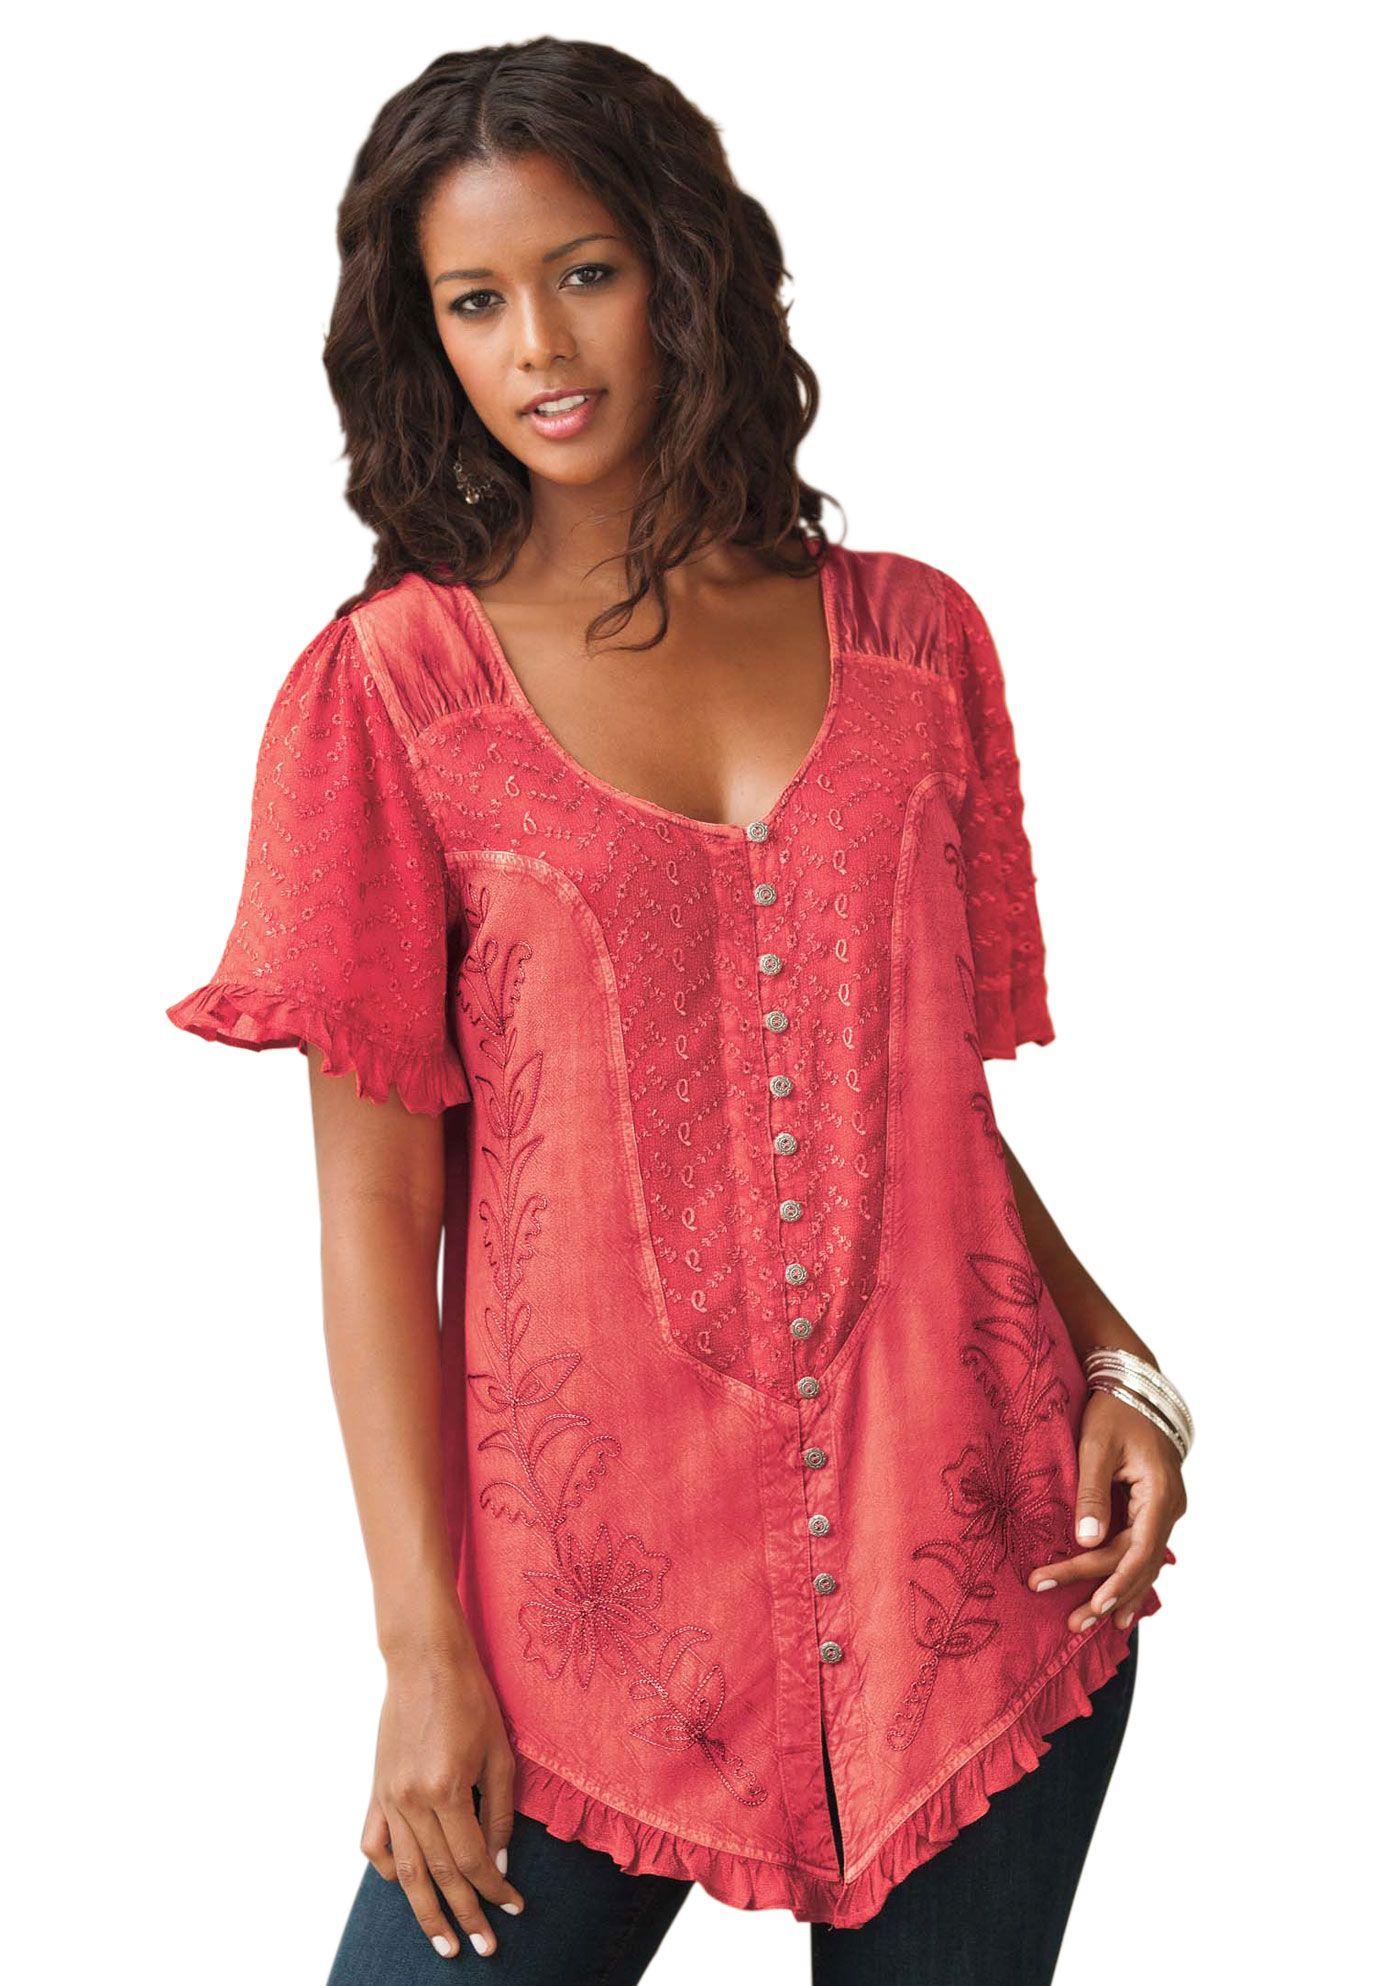 The acid wash blouse by denim plus size short sleeve